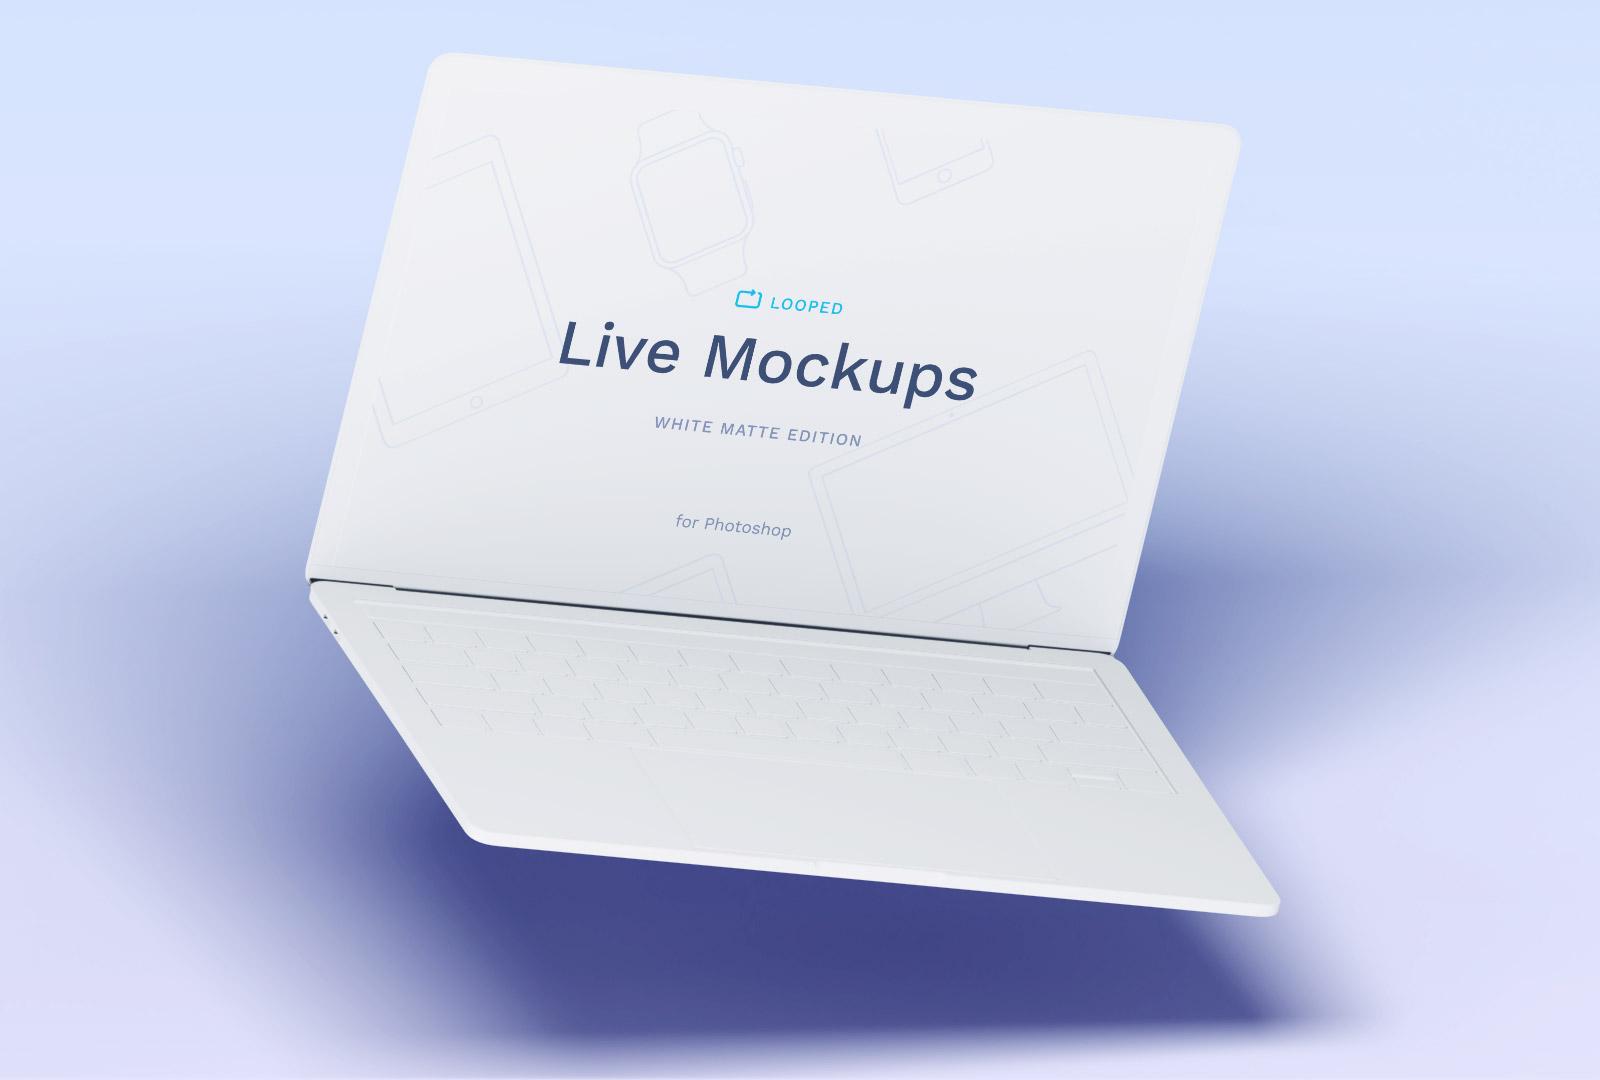 Free White Macbook Mockup PSD